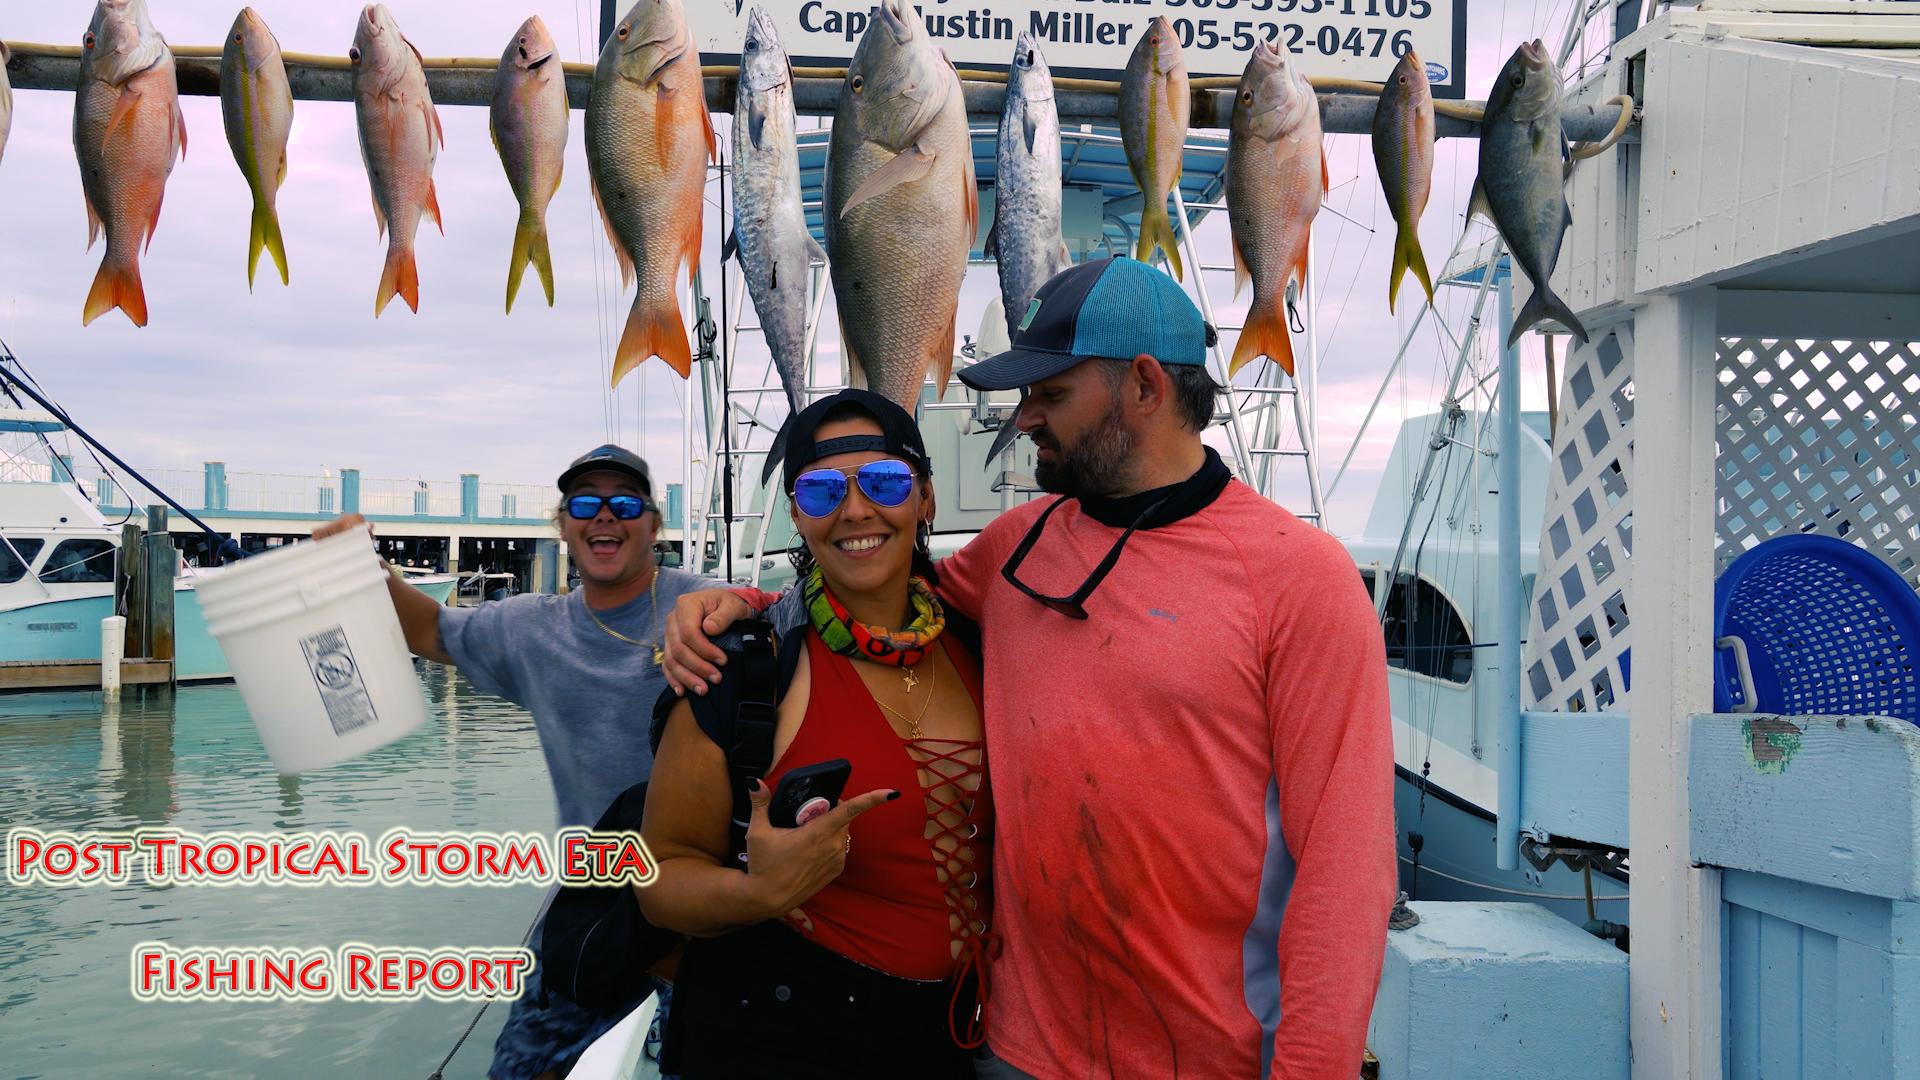 Post Tropical Storm ETA Fishing Report